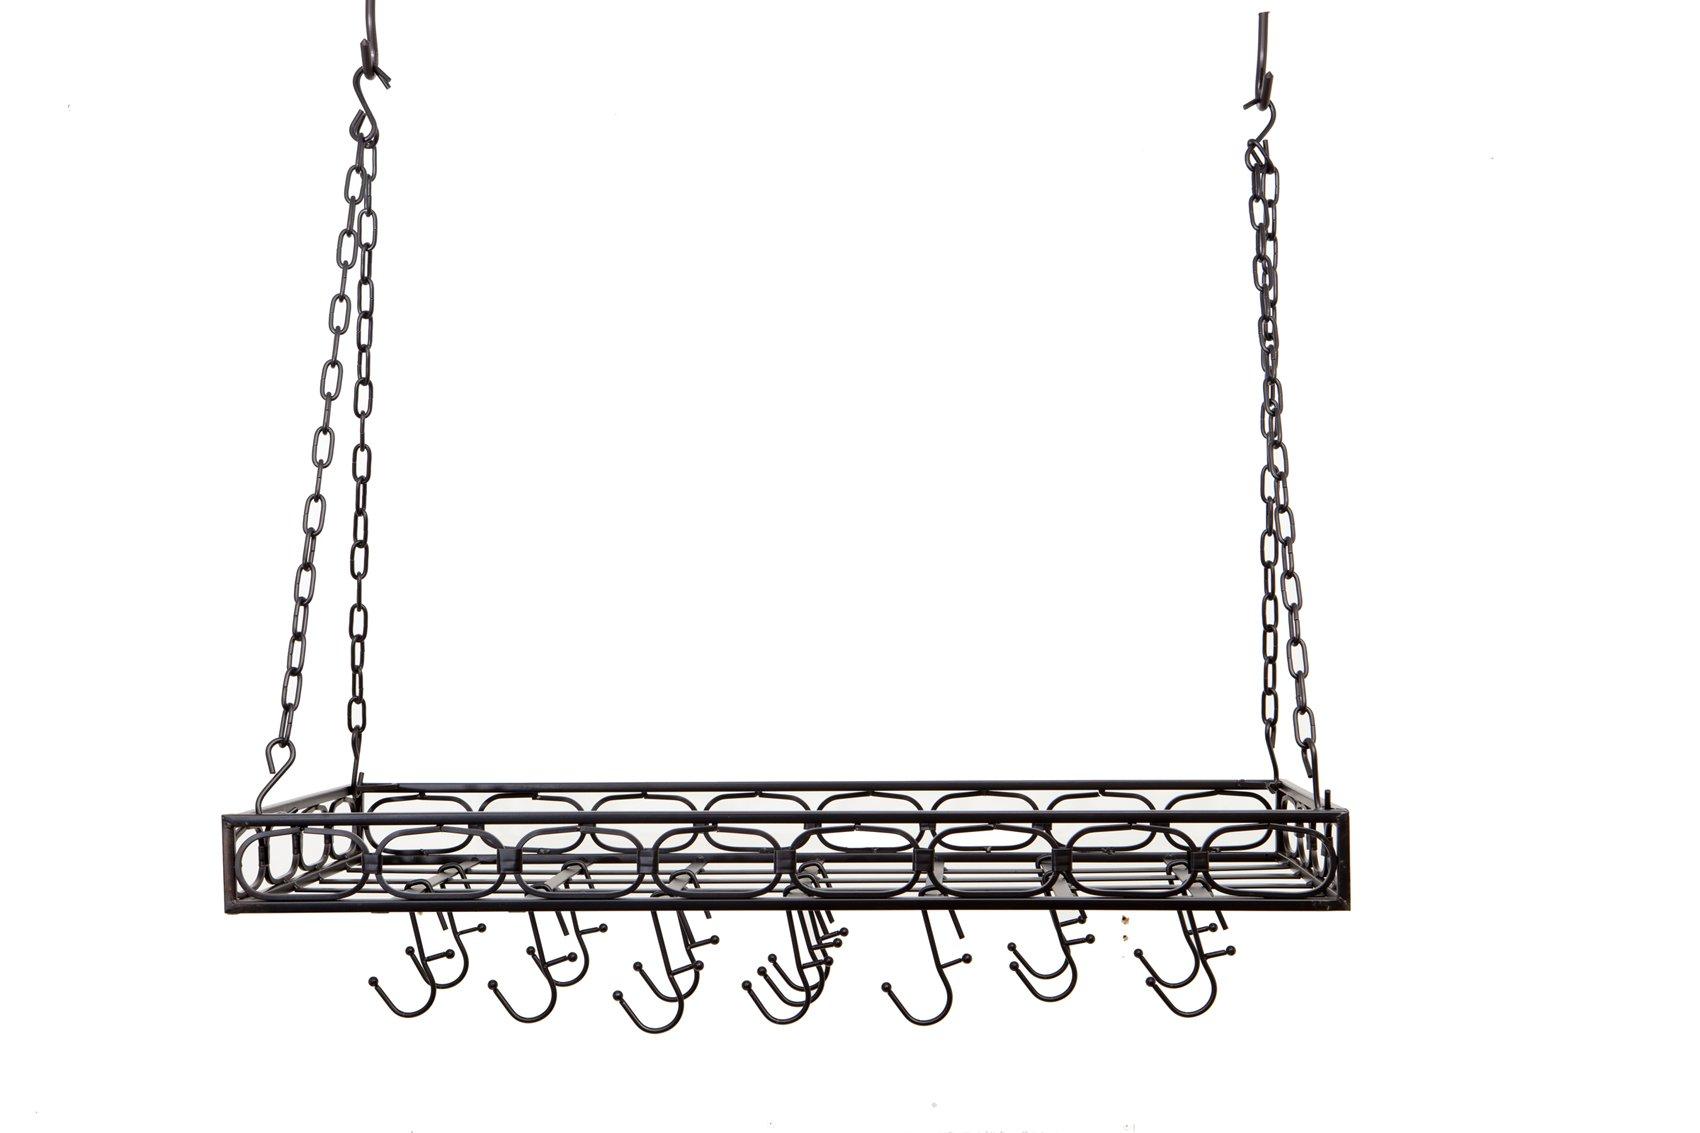 Old Dutch Rectangular Hanging Pot Rack with 16 Hooks, Matte Black, 36 x 18 x 4 inches